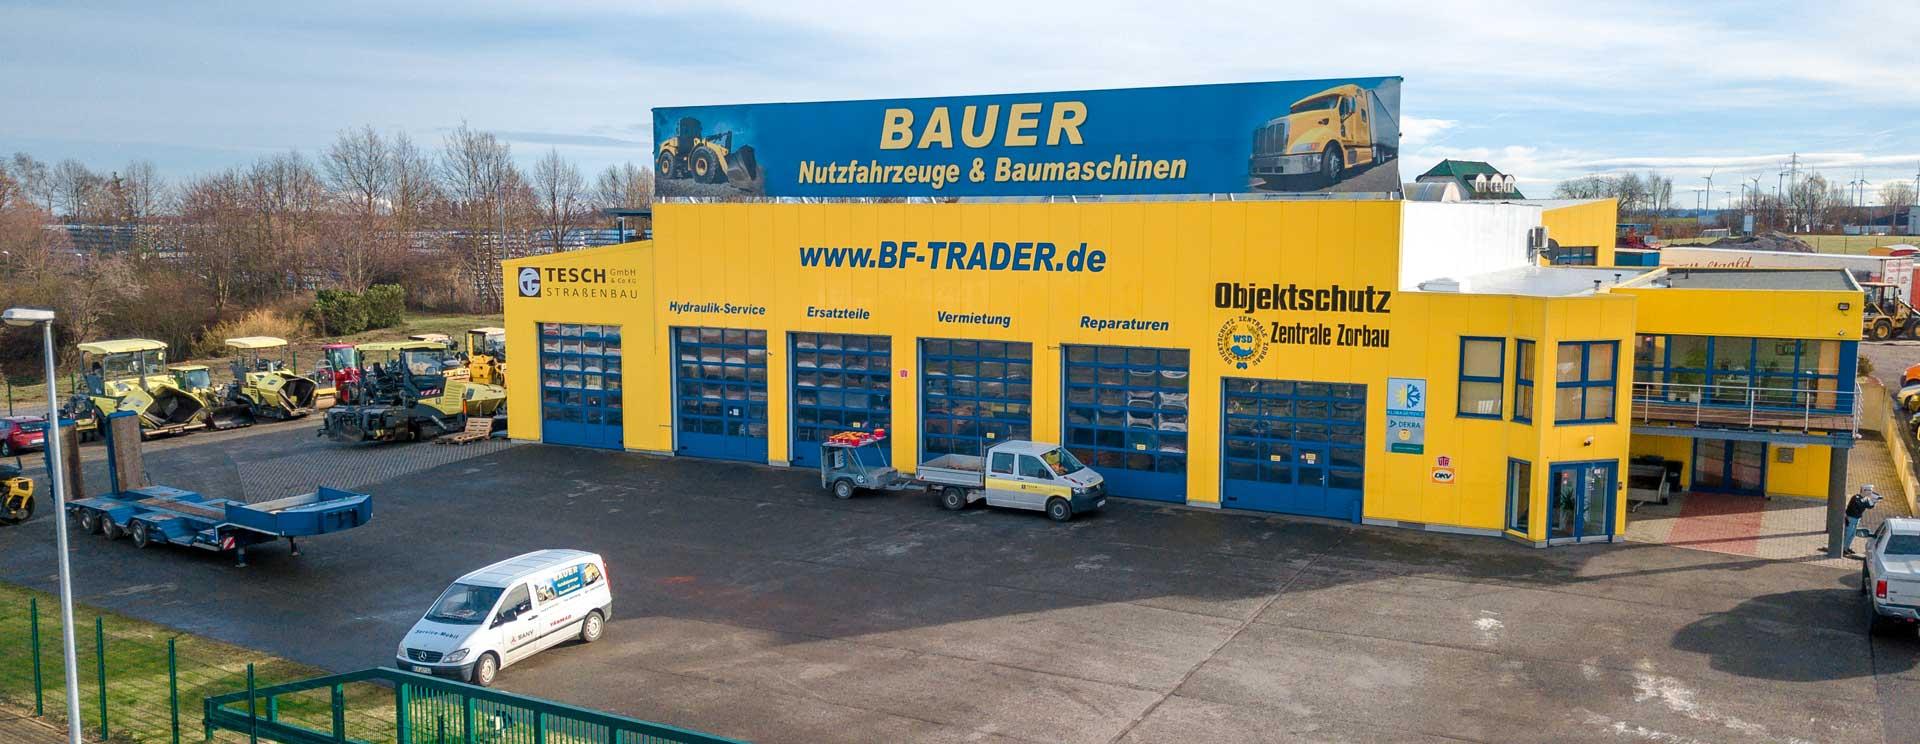 DJI_David-Cray_Winterbergpromotion_Bauer-Baumaschinenhandel-Zorbau-a9